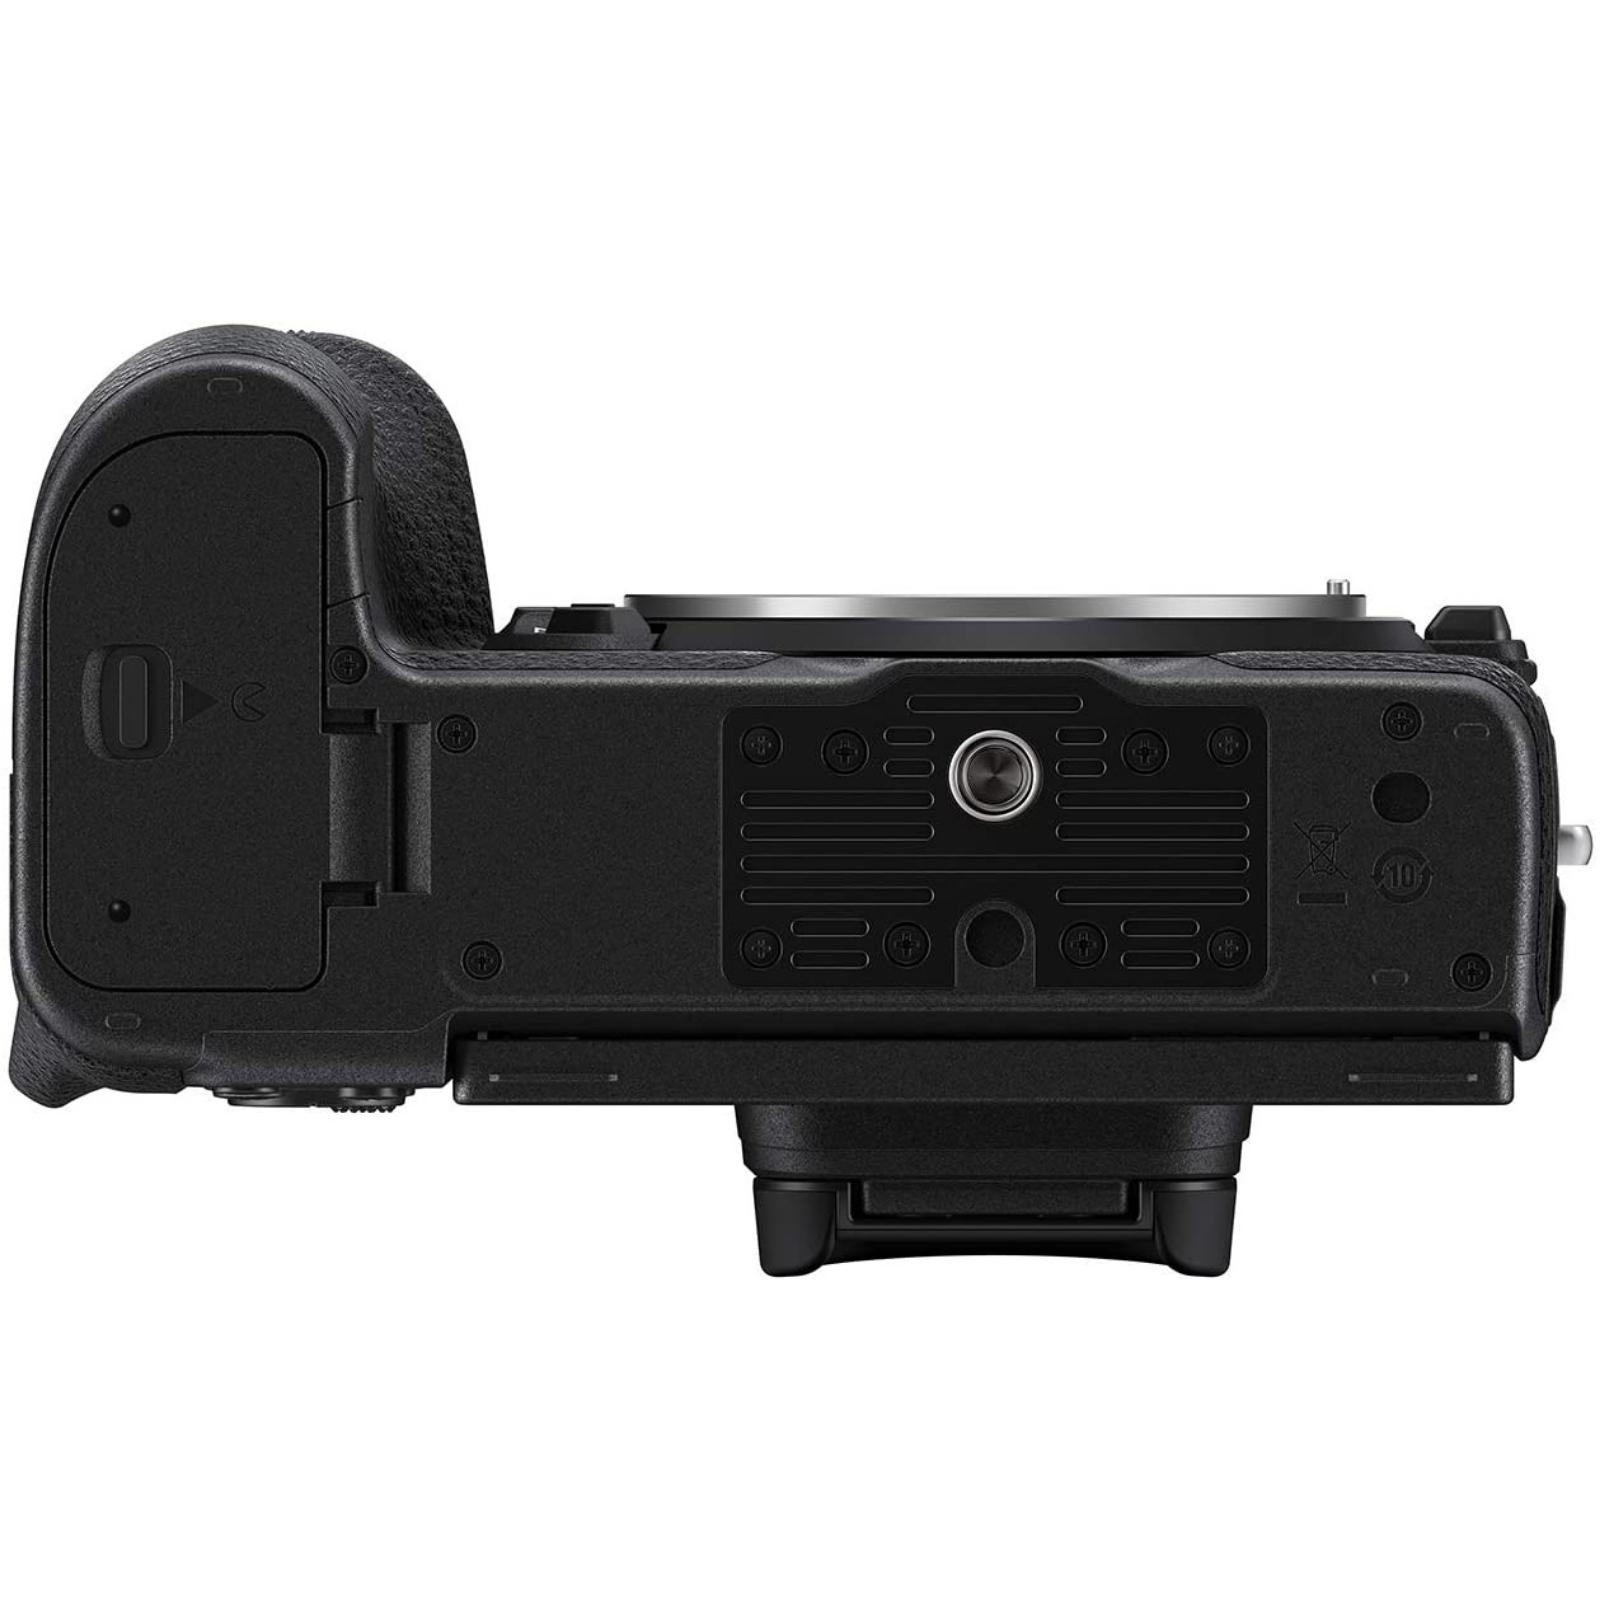 Nikon ニコン ミラーレス一眼カメラ Z7 ボディ ブラック 新品